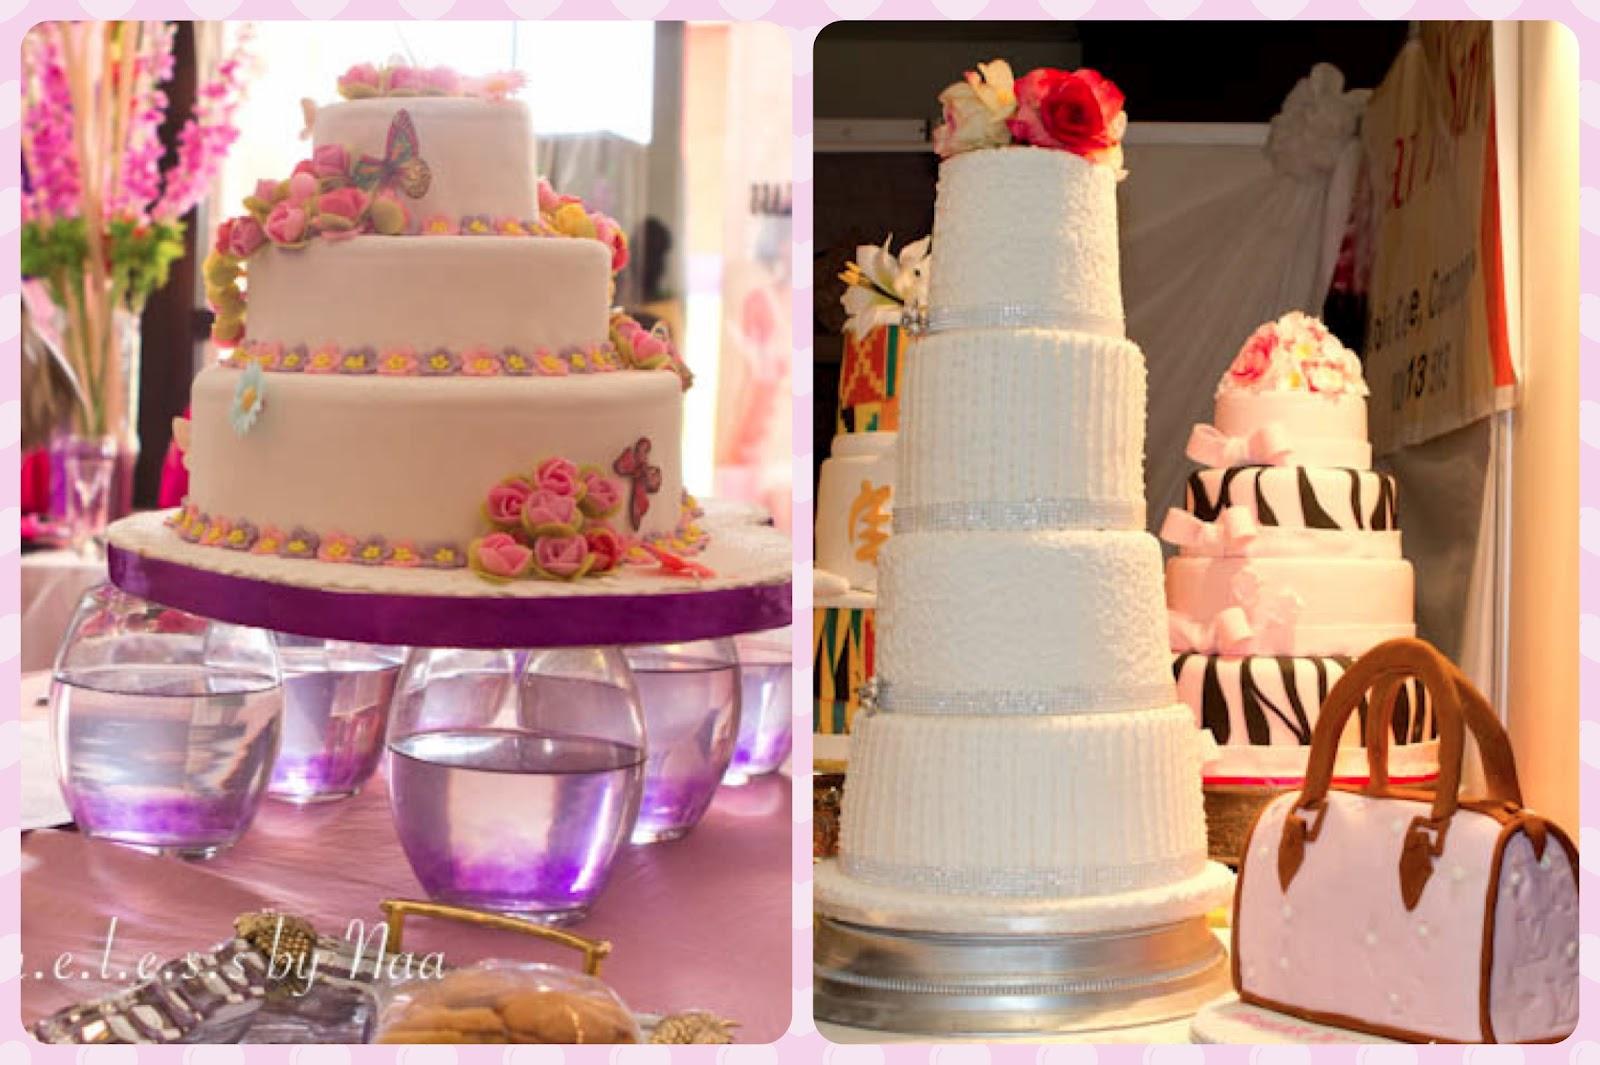 Feeding People Wedding Cakes